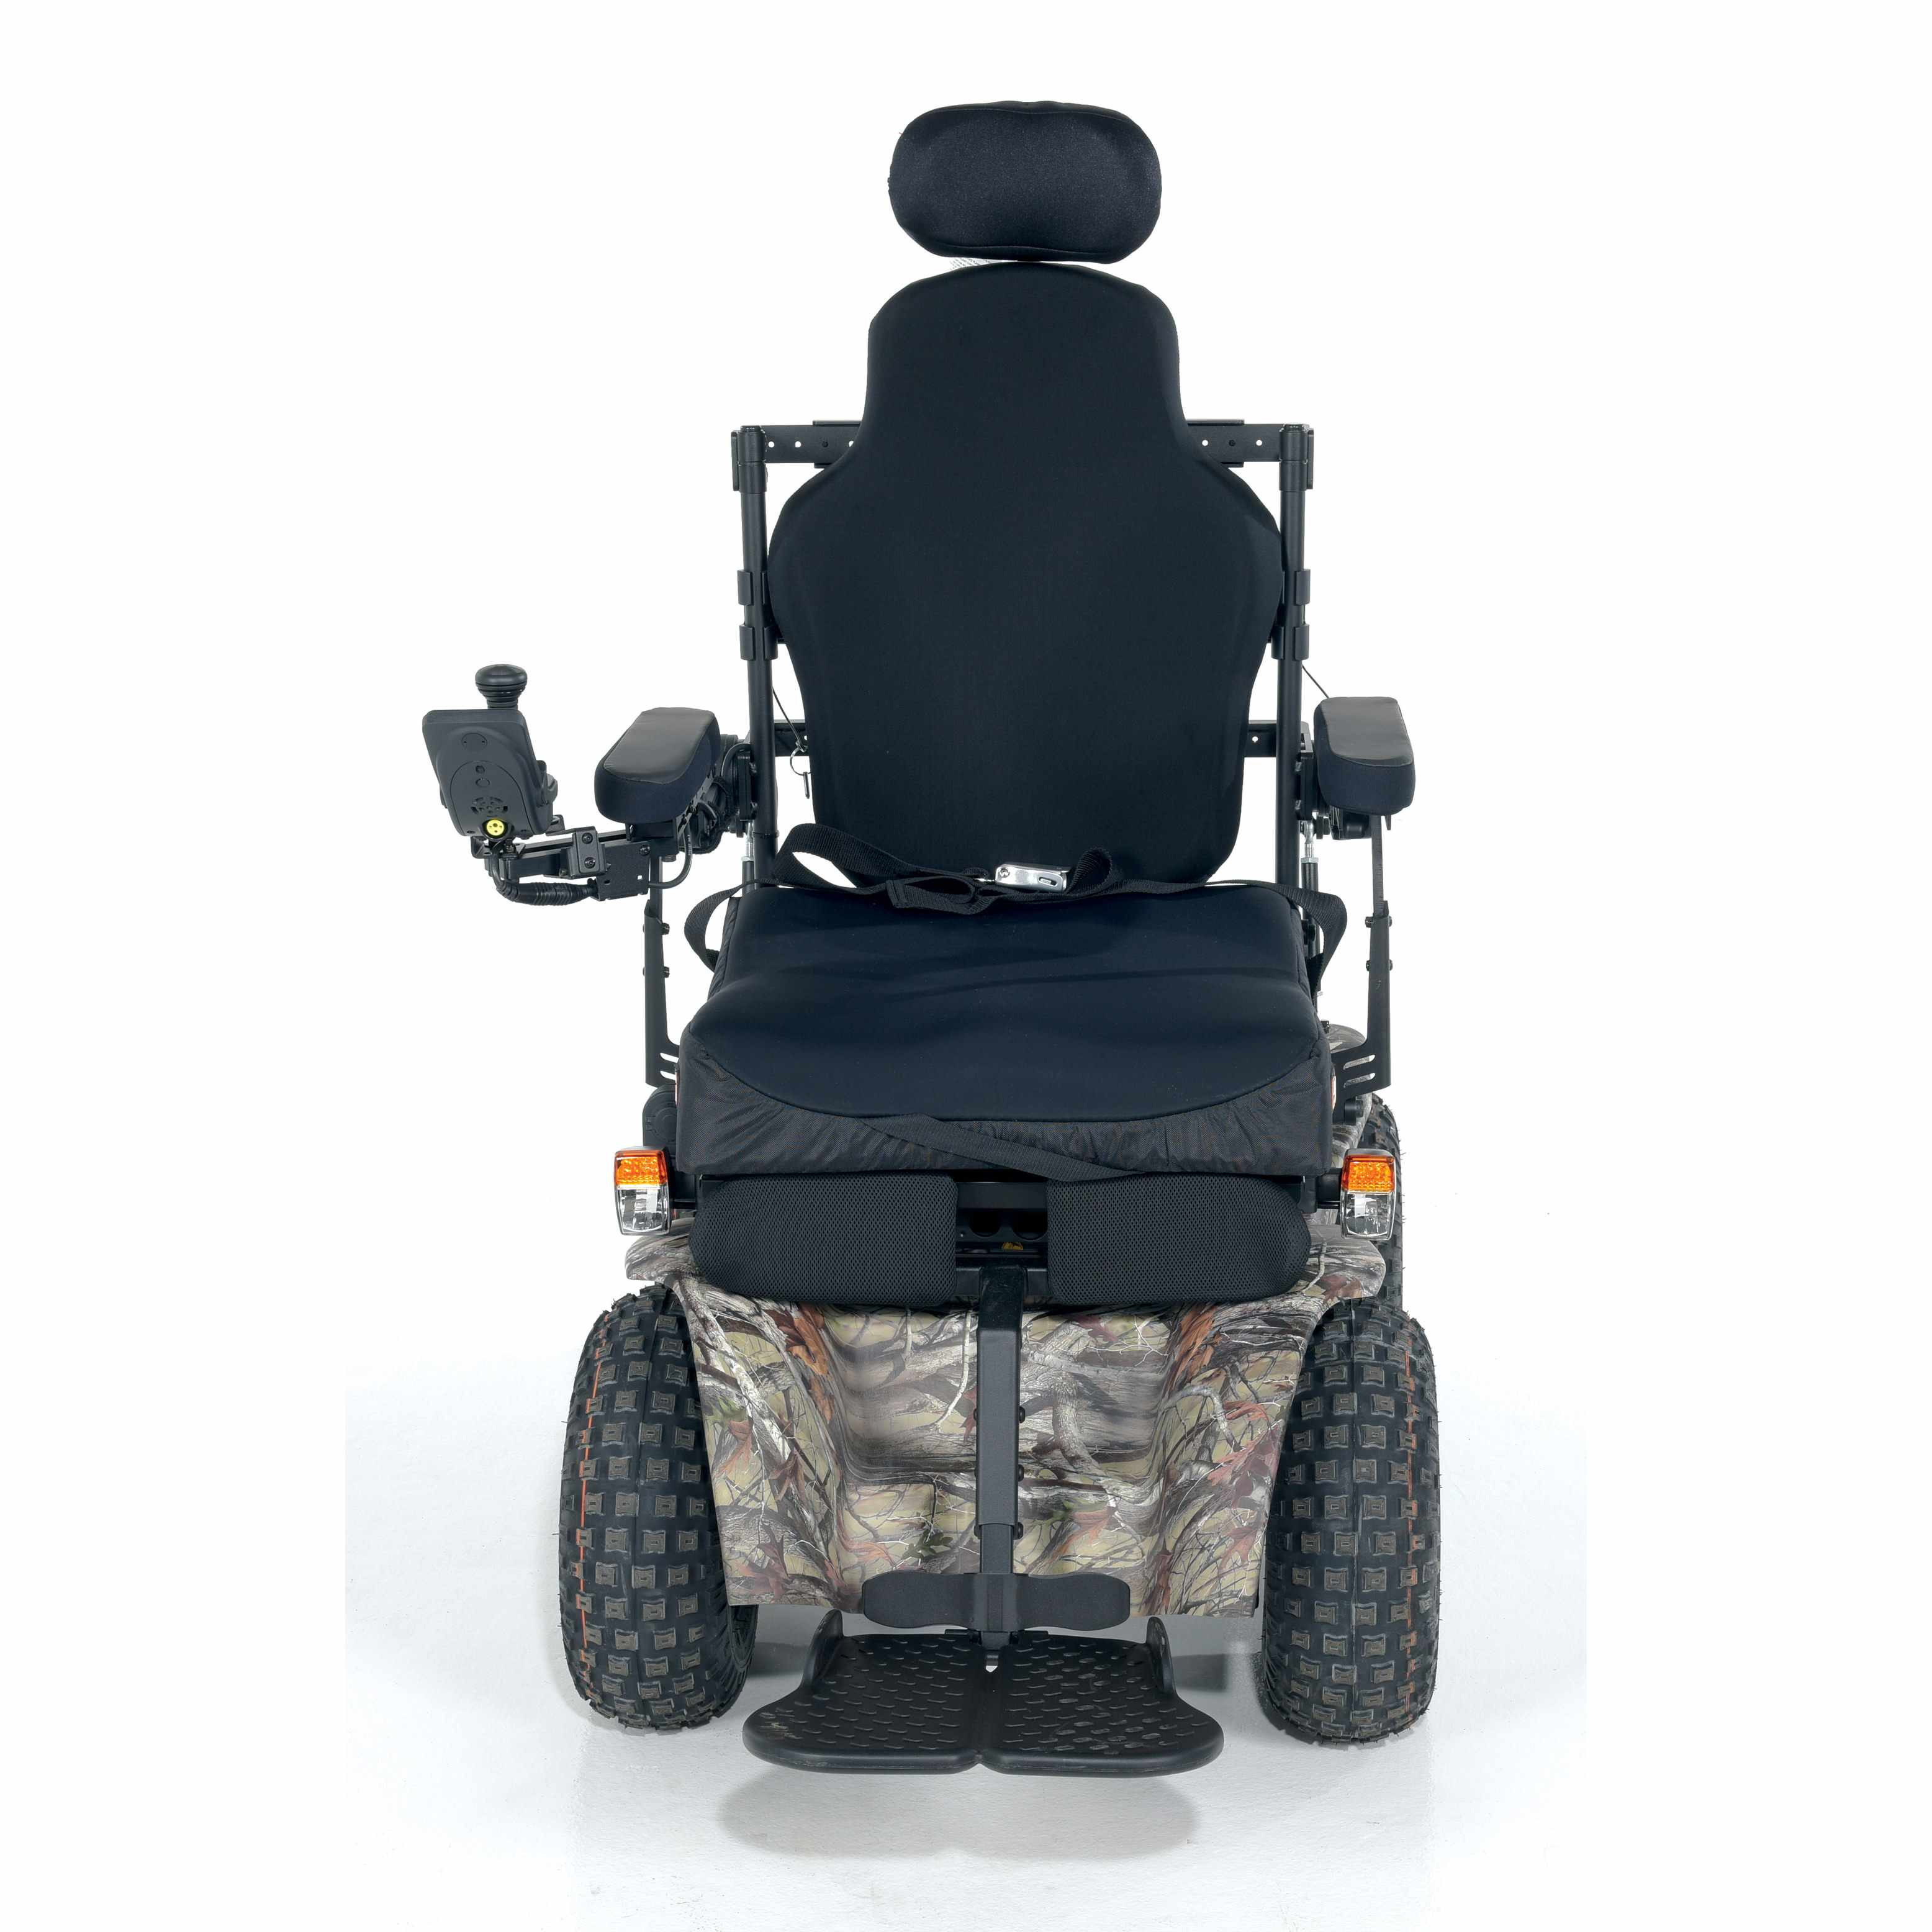 Magic Mobility Extreme X8 4WD Power Wheelchair